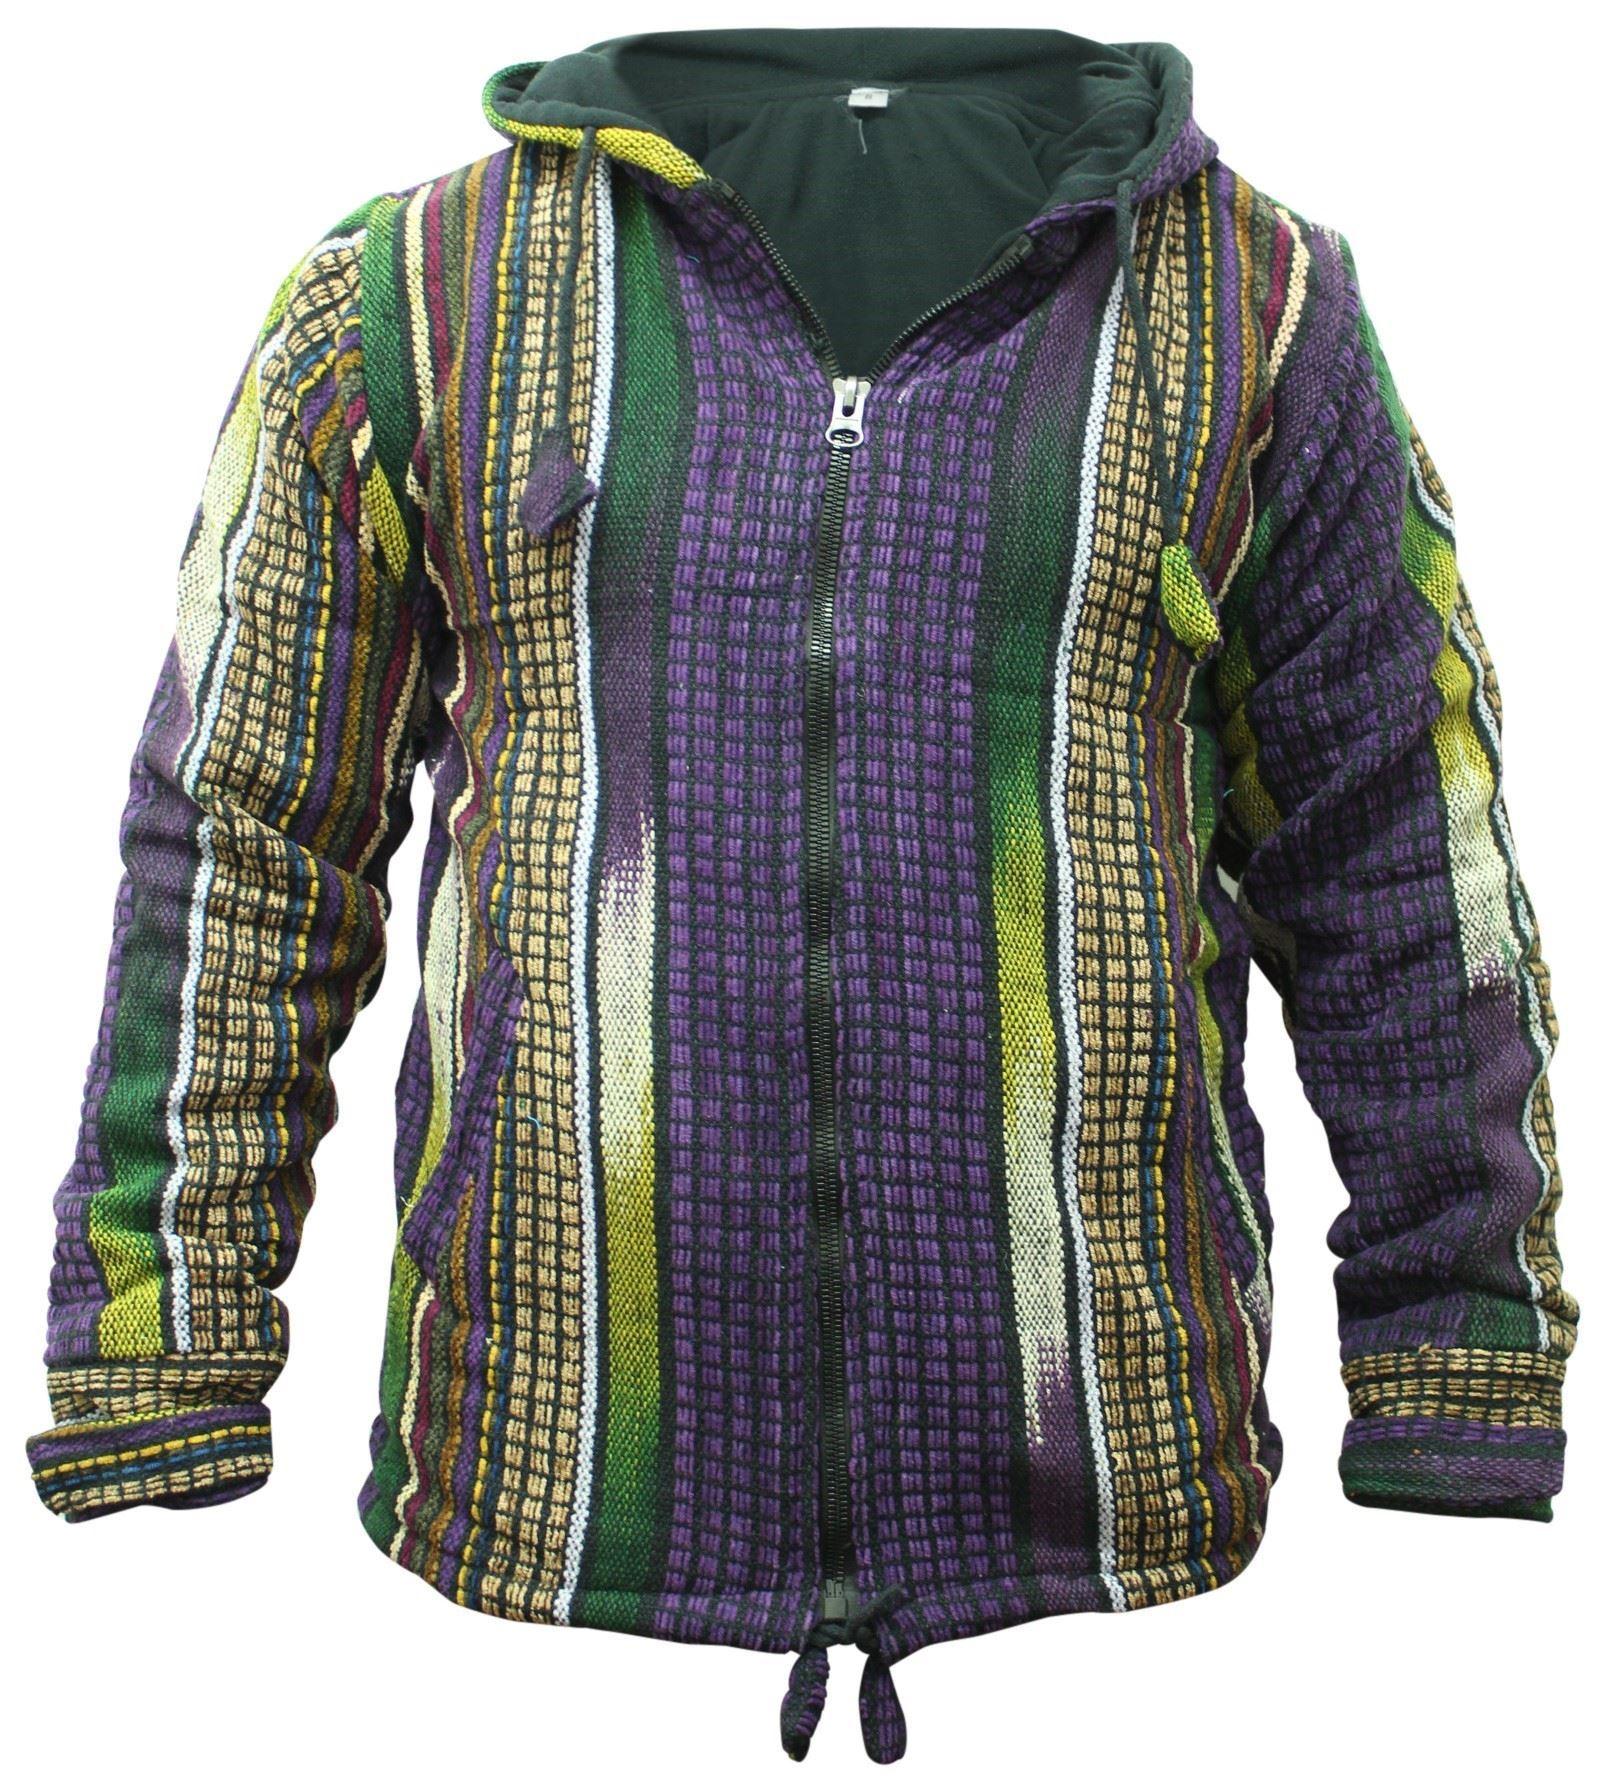 Mens-Heavy-Cotton-Fleece-Lined-Jacket-Hippy-WInter-Festival-Hoodie thumbnail 4